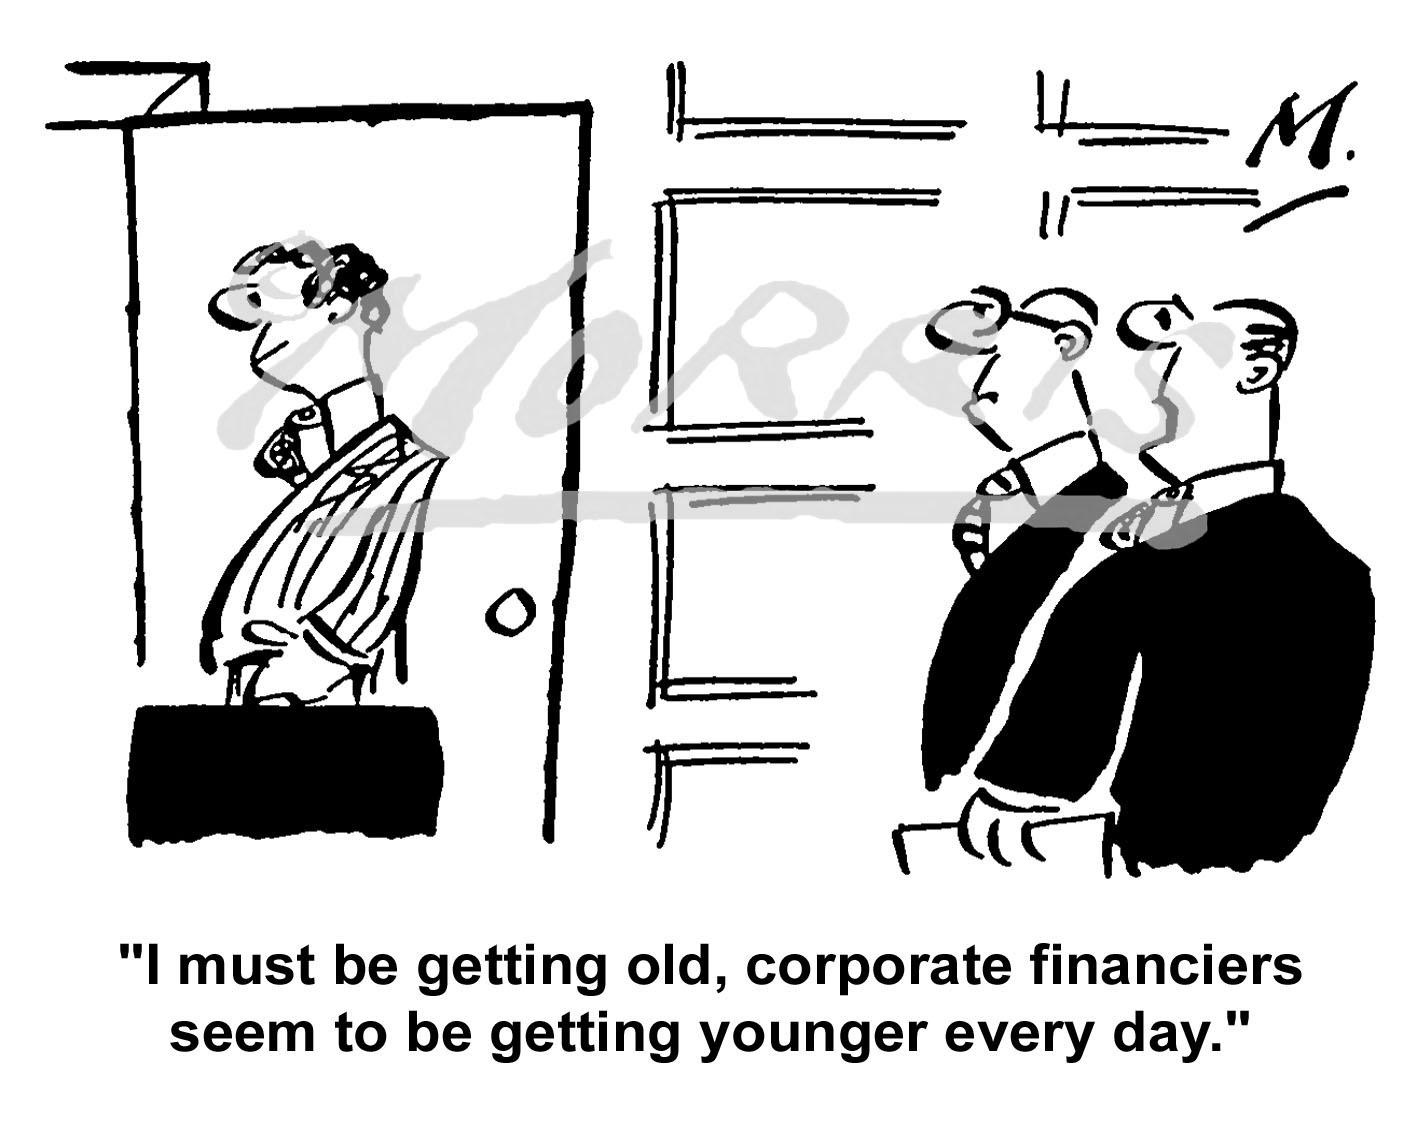 Corporate financier cartoon Ref: 0707bw